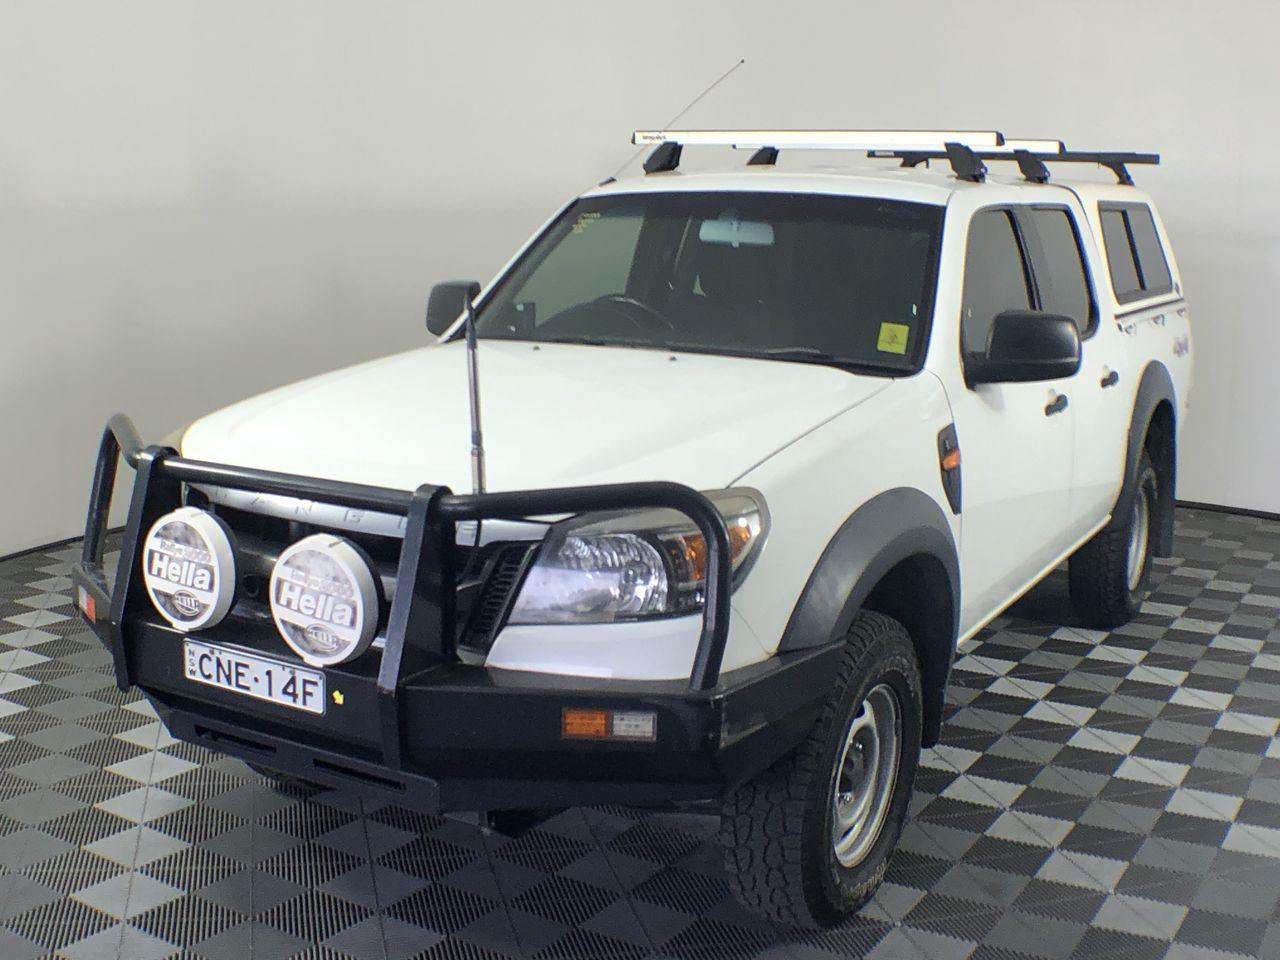 2011 Ford Ranger XL 4x4 Auto T/Diesel Dual Cab Ute w/ Canopy